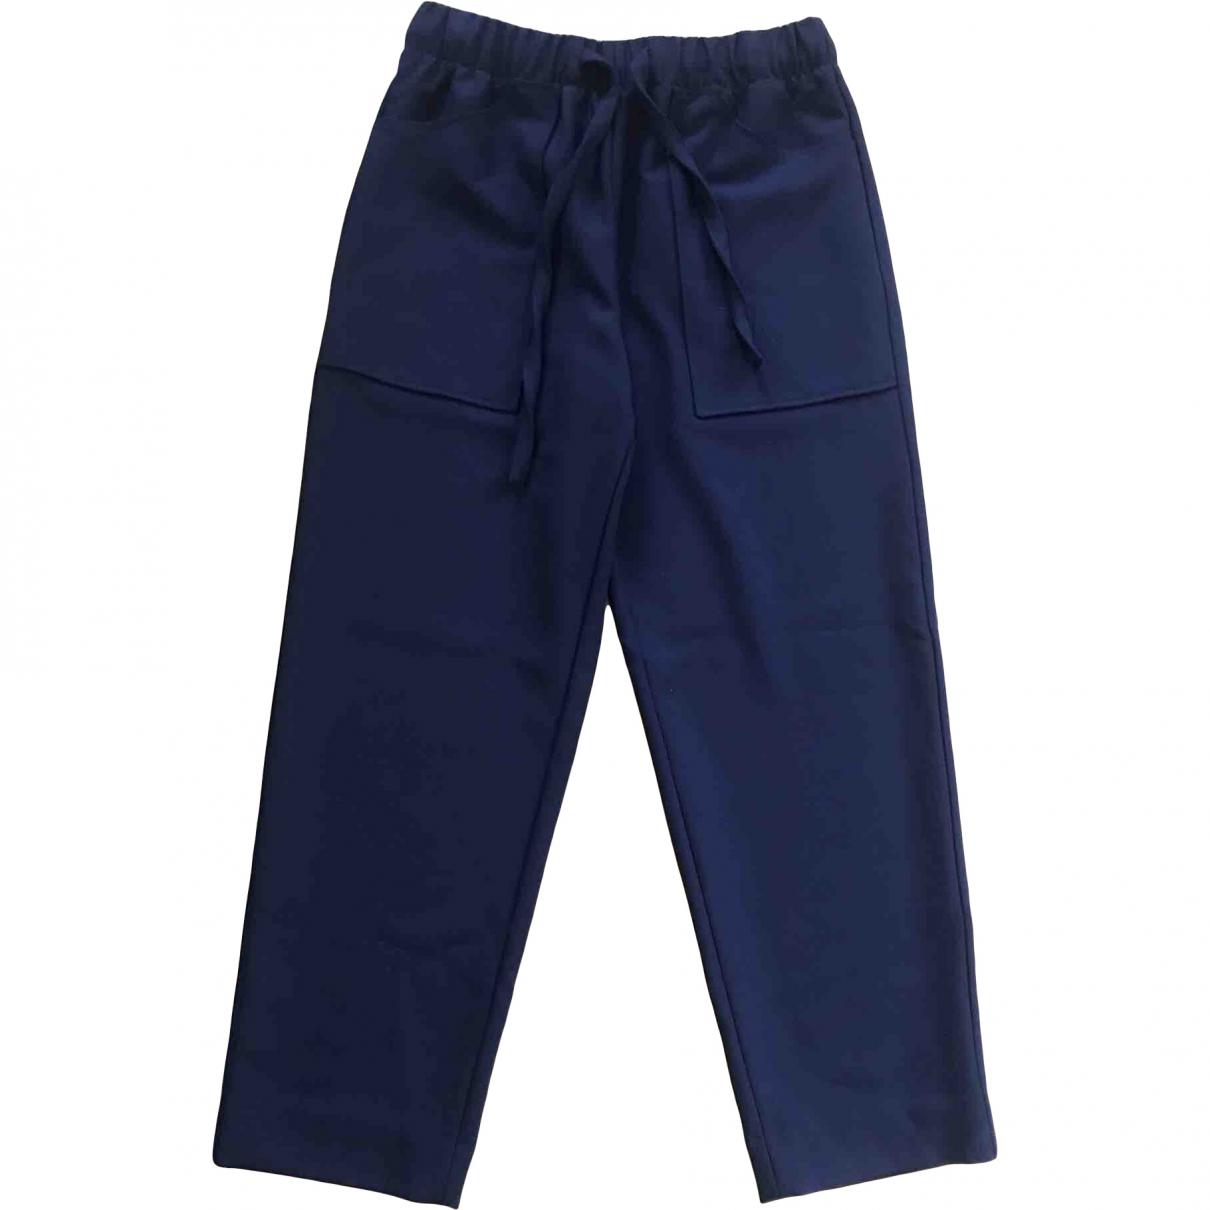 Maje \N Navy Trousers for Women 38 FR